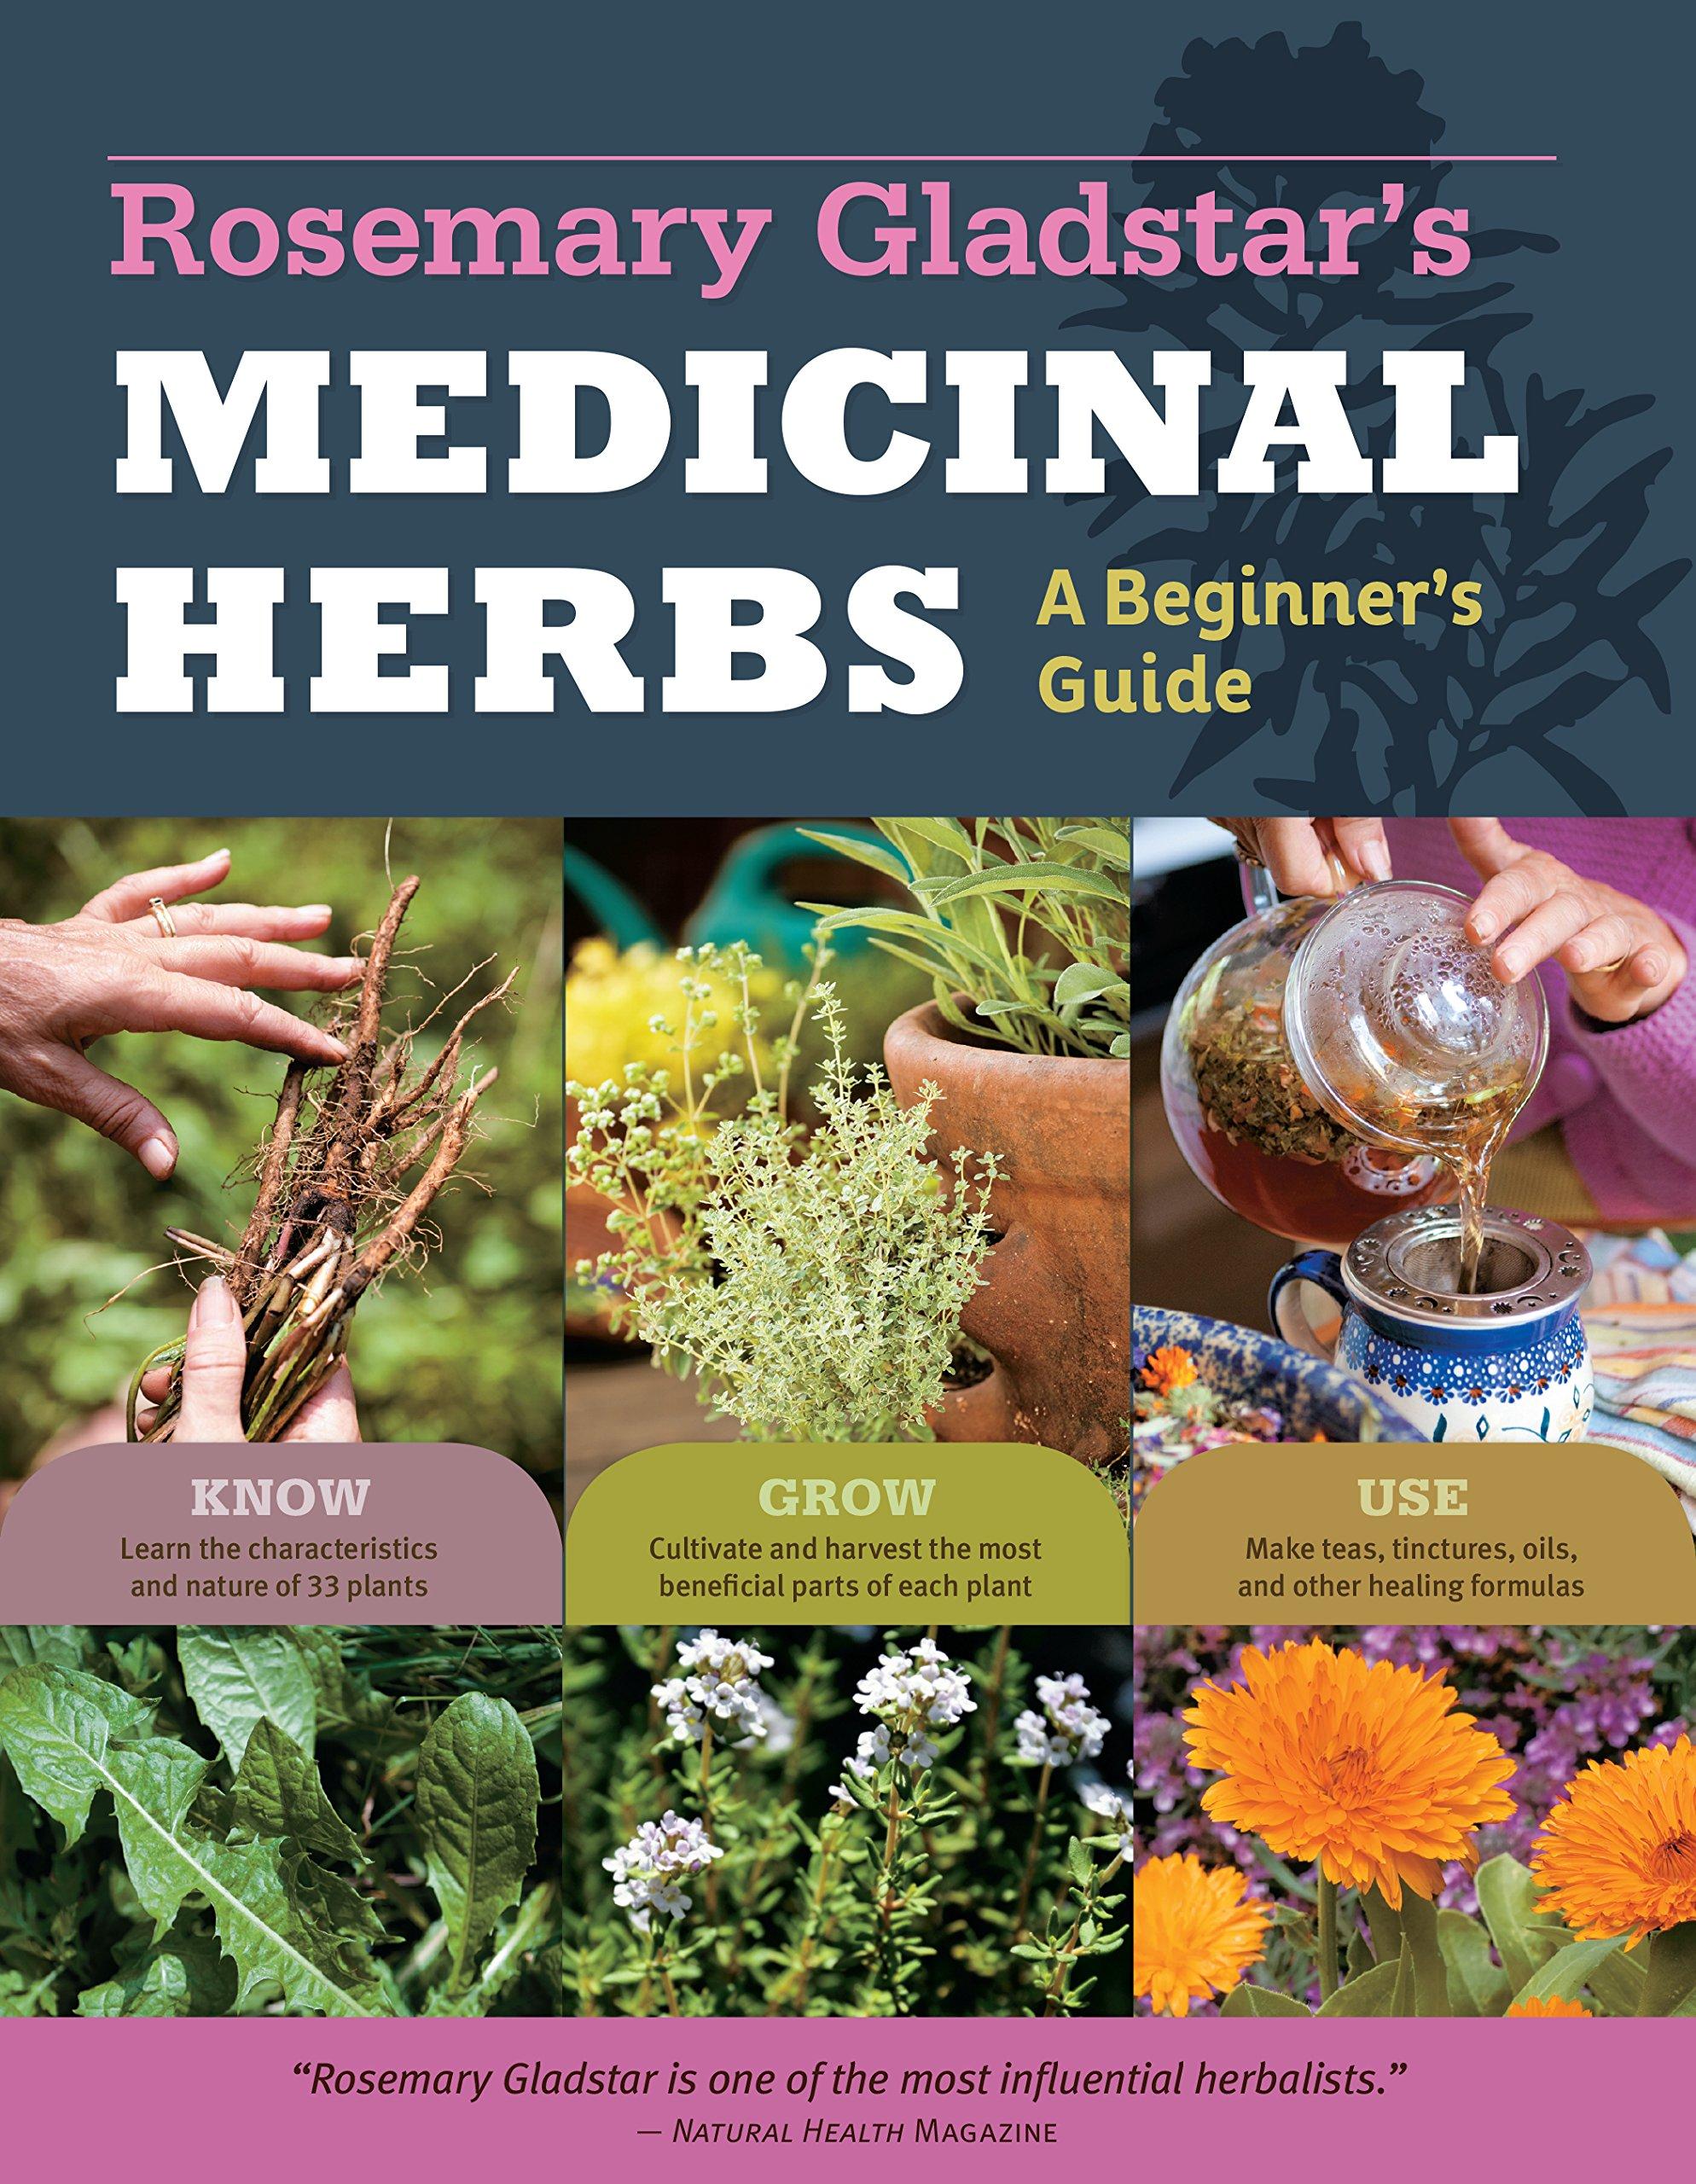 Rosemary Gladstars Medicinal Herbs Beginners product image